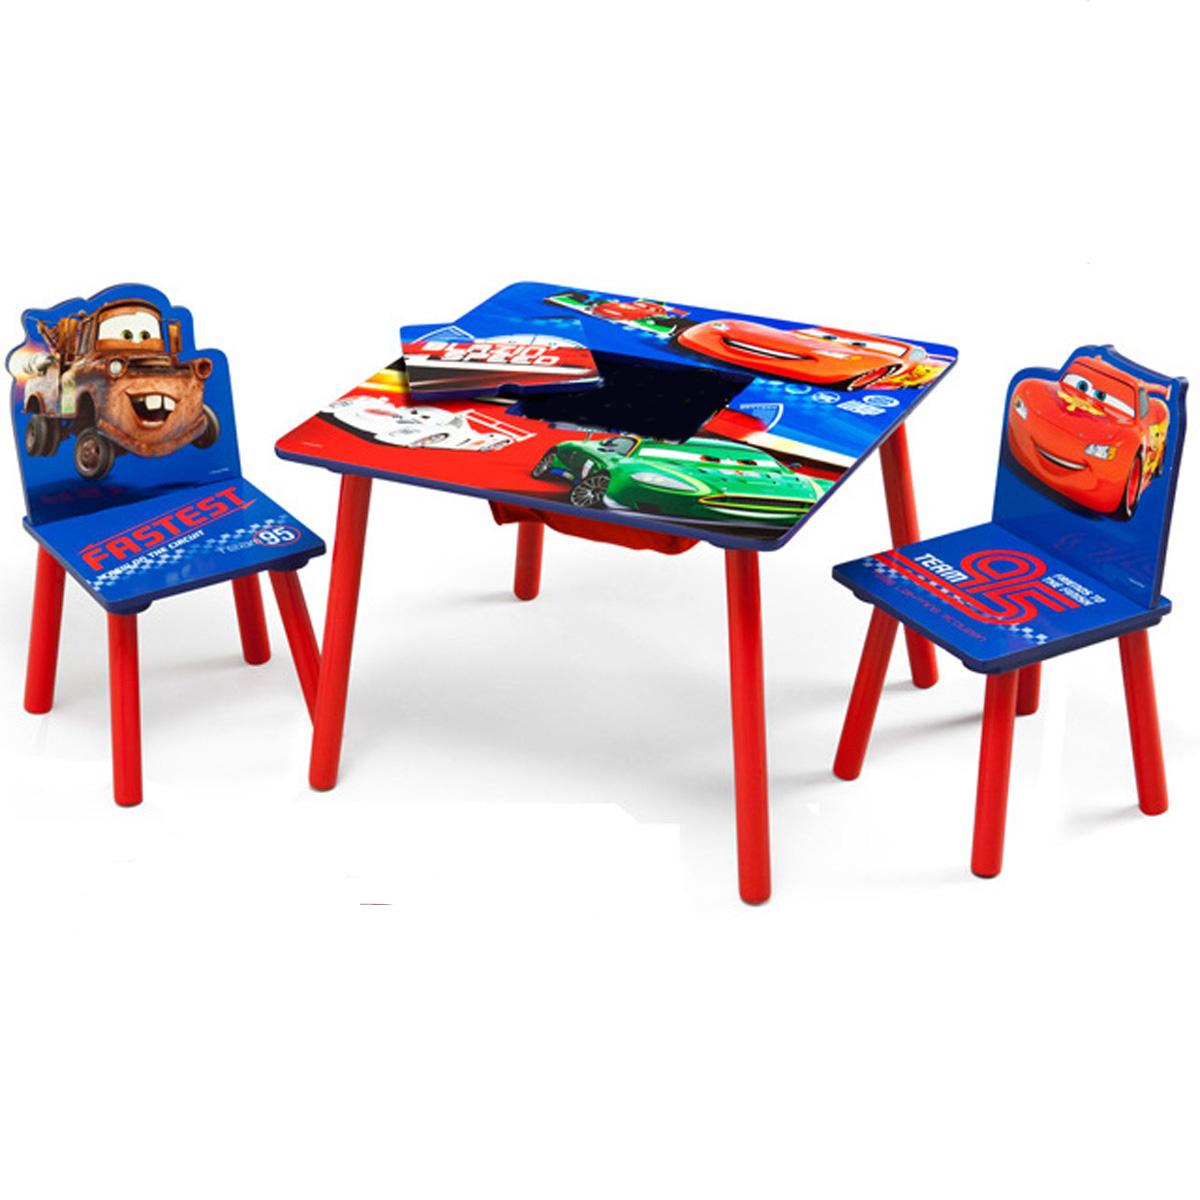 Disney Kindersitzgruppe Cars Tisch 2 Stühle Netz Sitzgruppe